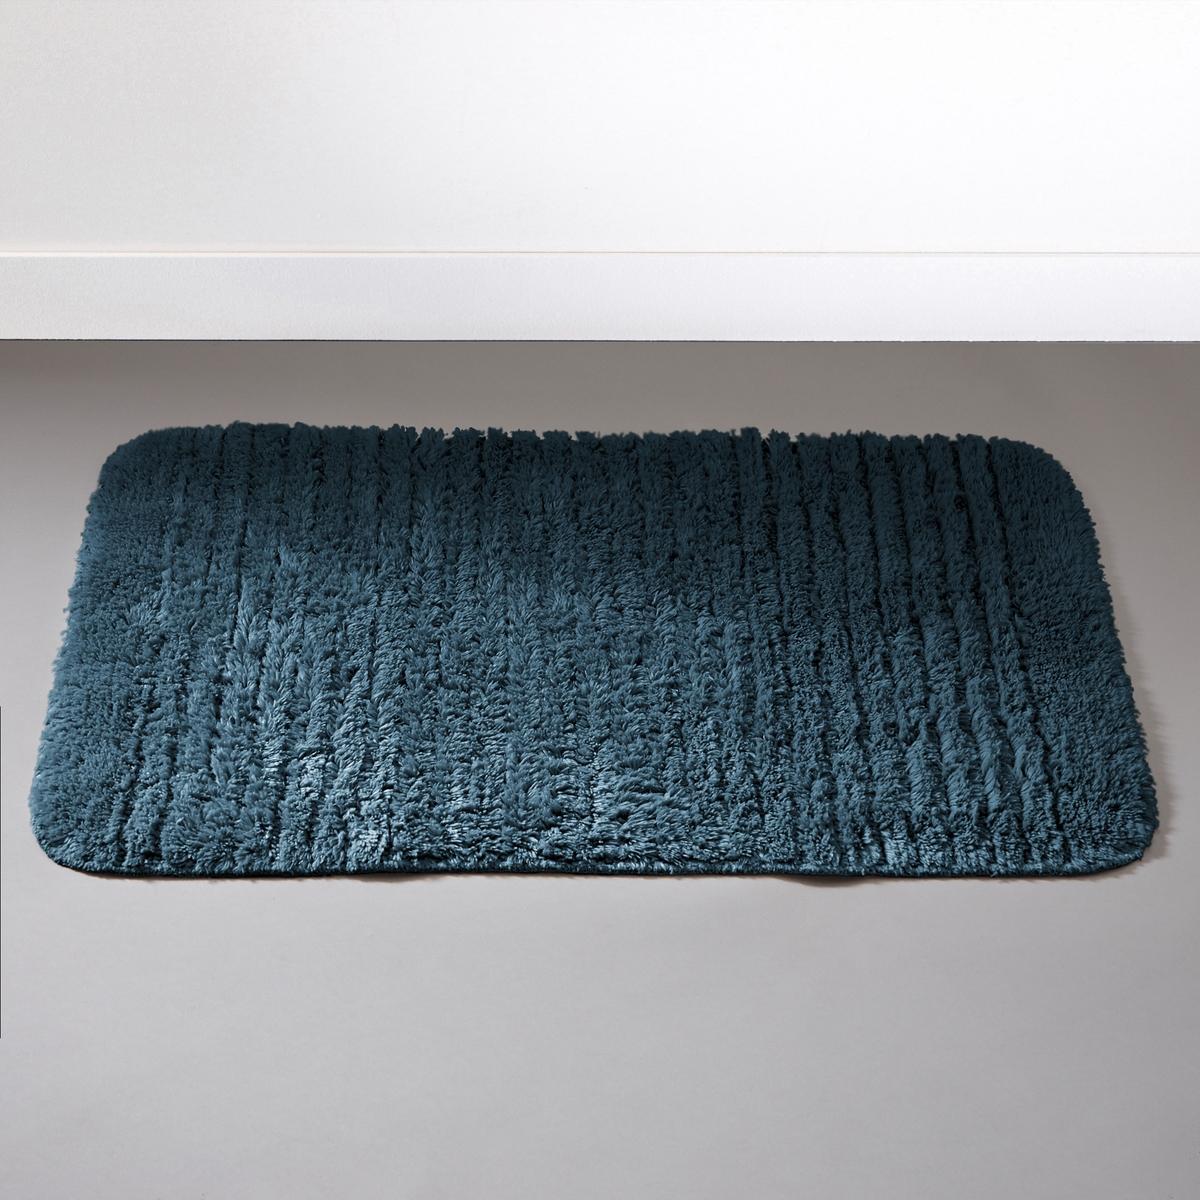 Tappeto da bagno tinta unita tufté 1100 g/m² SCENARIO